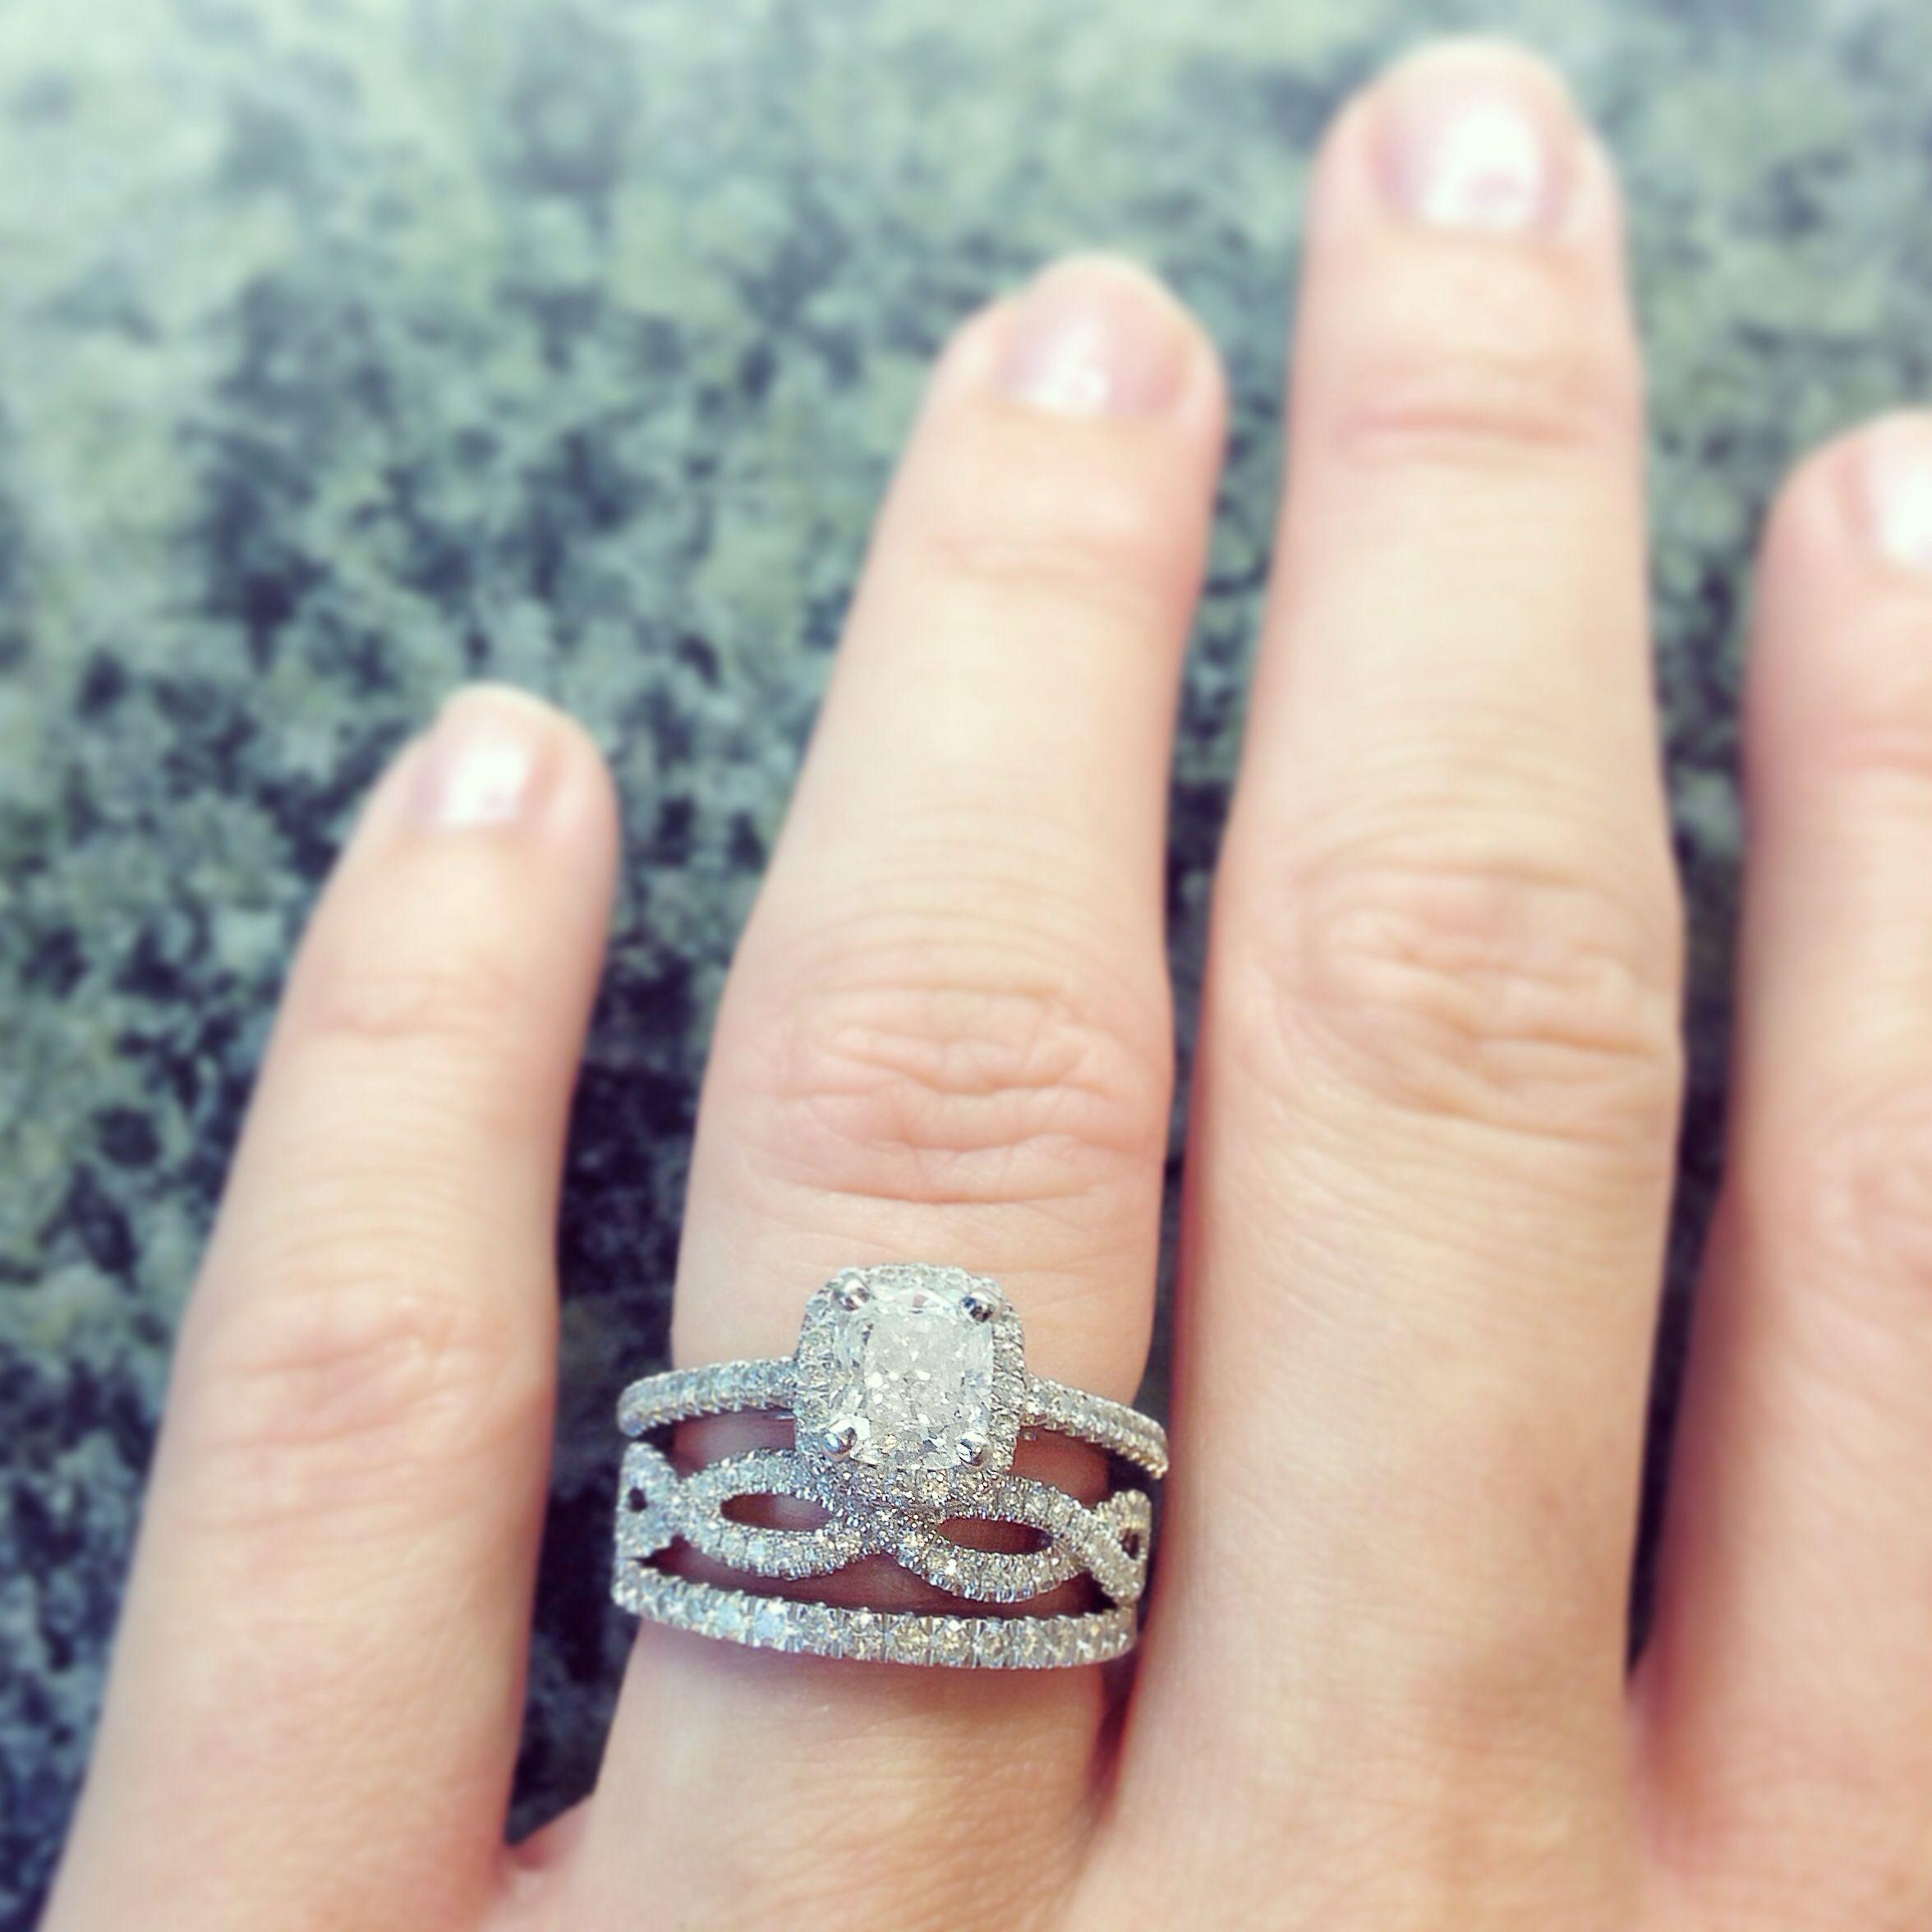 blue nile infinity twist engagement ring